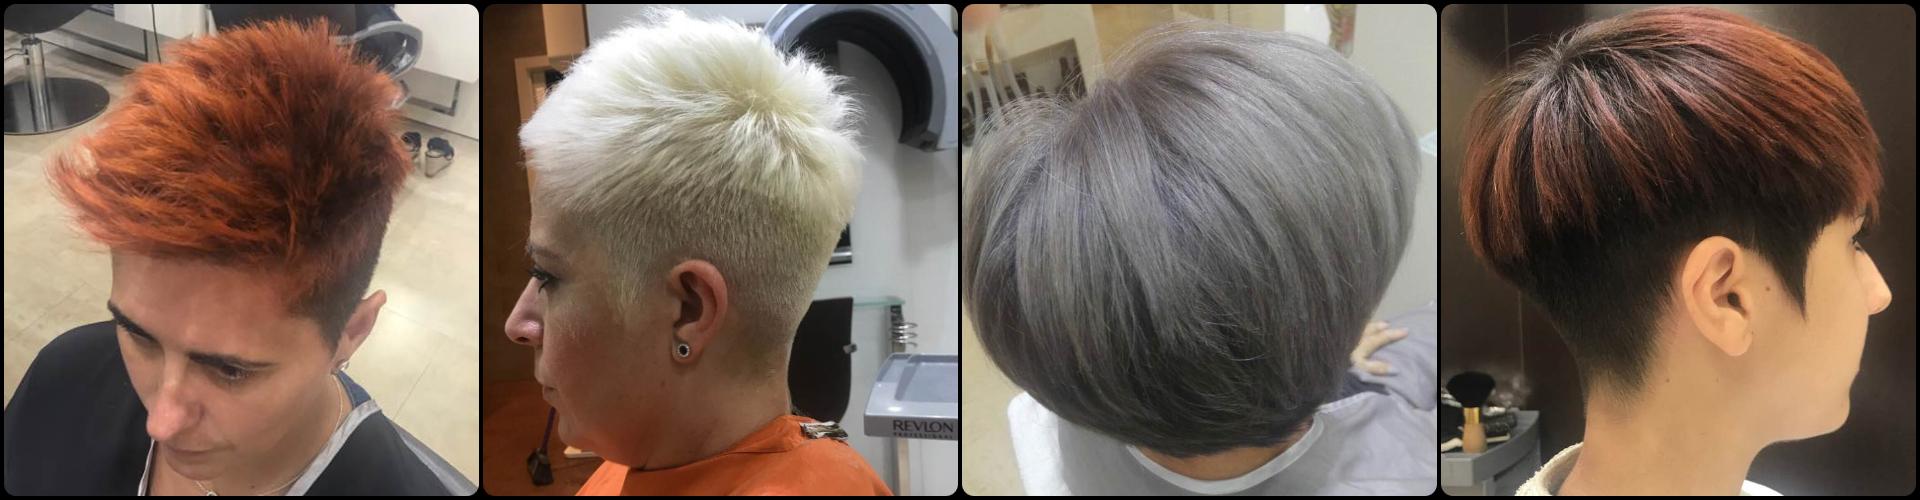 peluqueria aysa en motril, peluquerias unisex en motril, estilismo en motril,